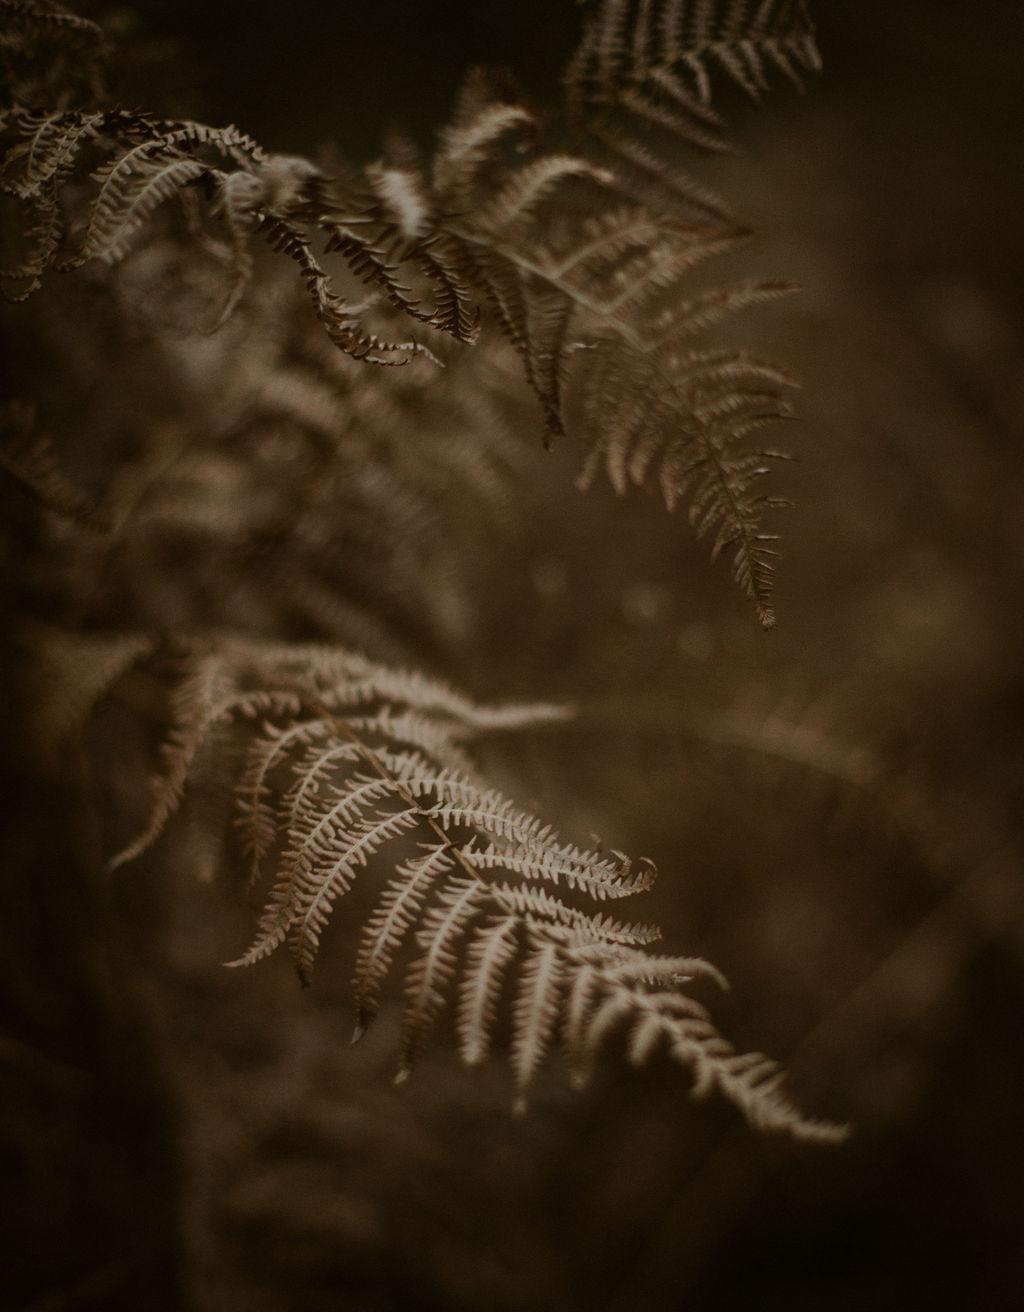 Fern by Ceranna Photography